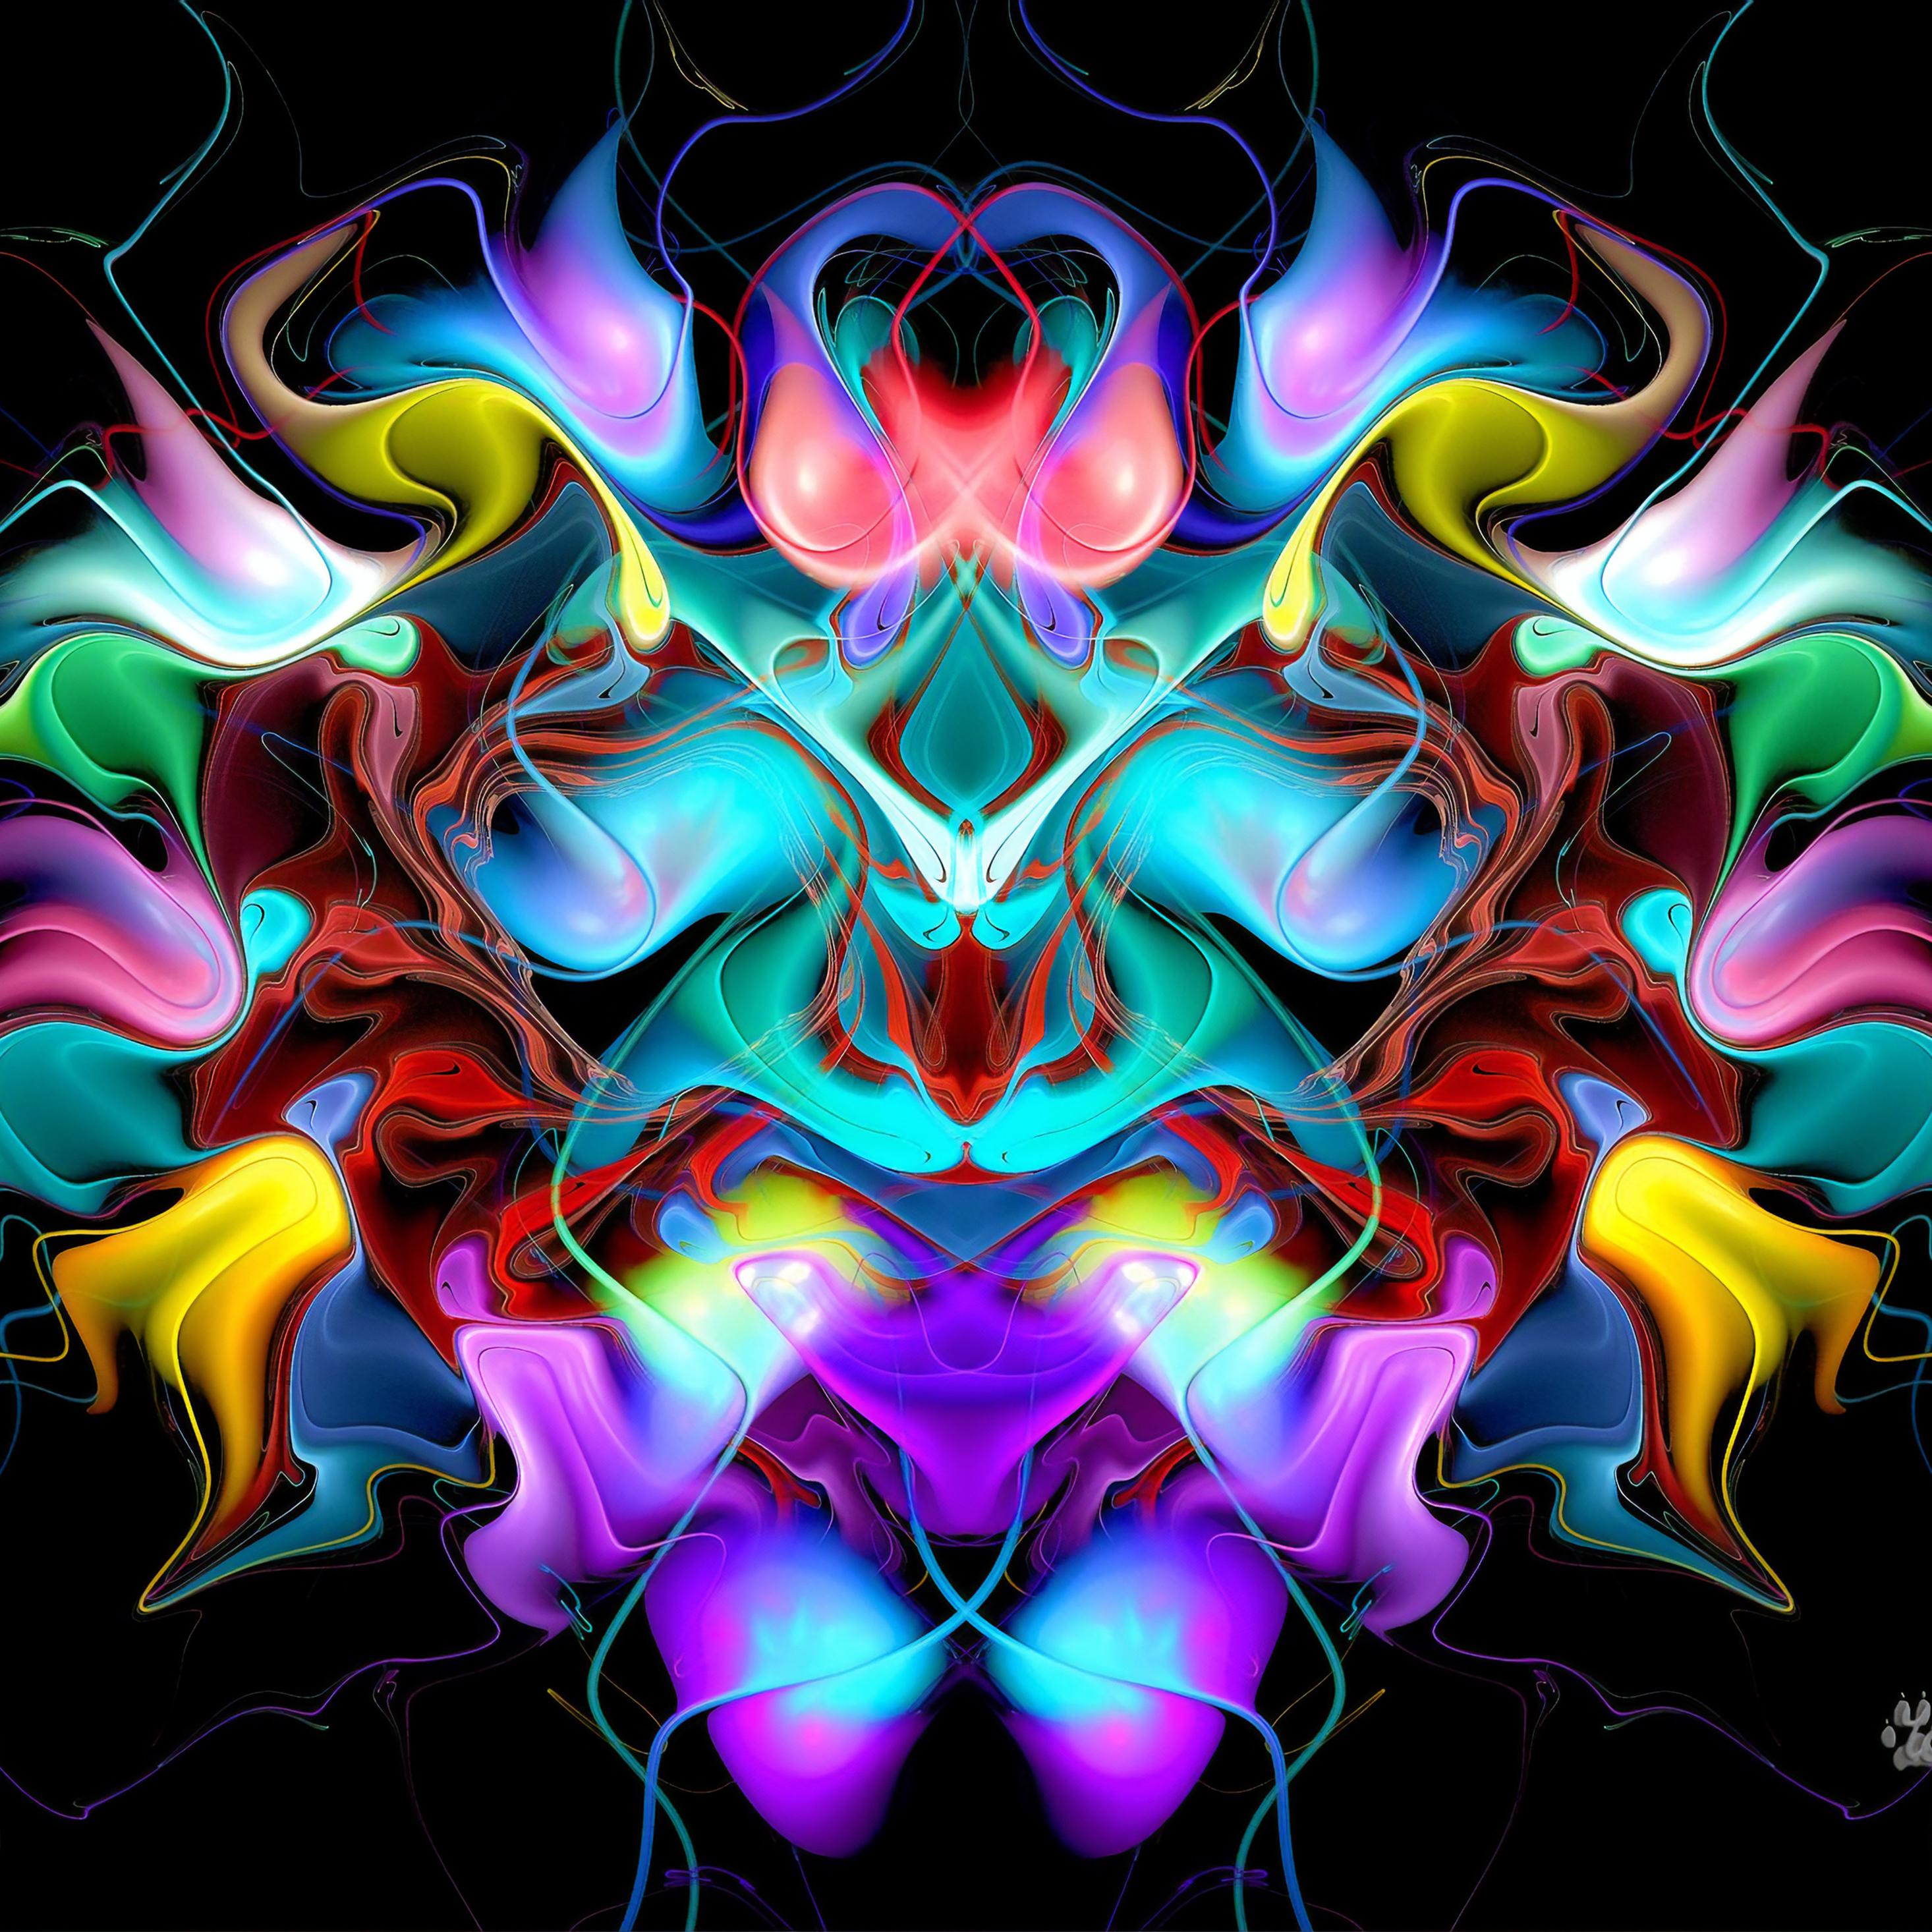 creature-colorful-pattern-4k-b4.jpg